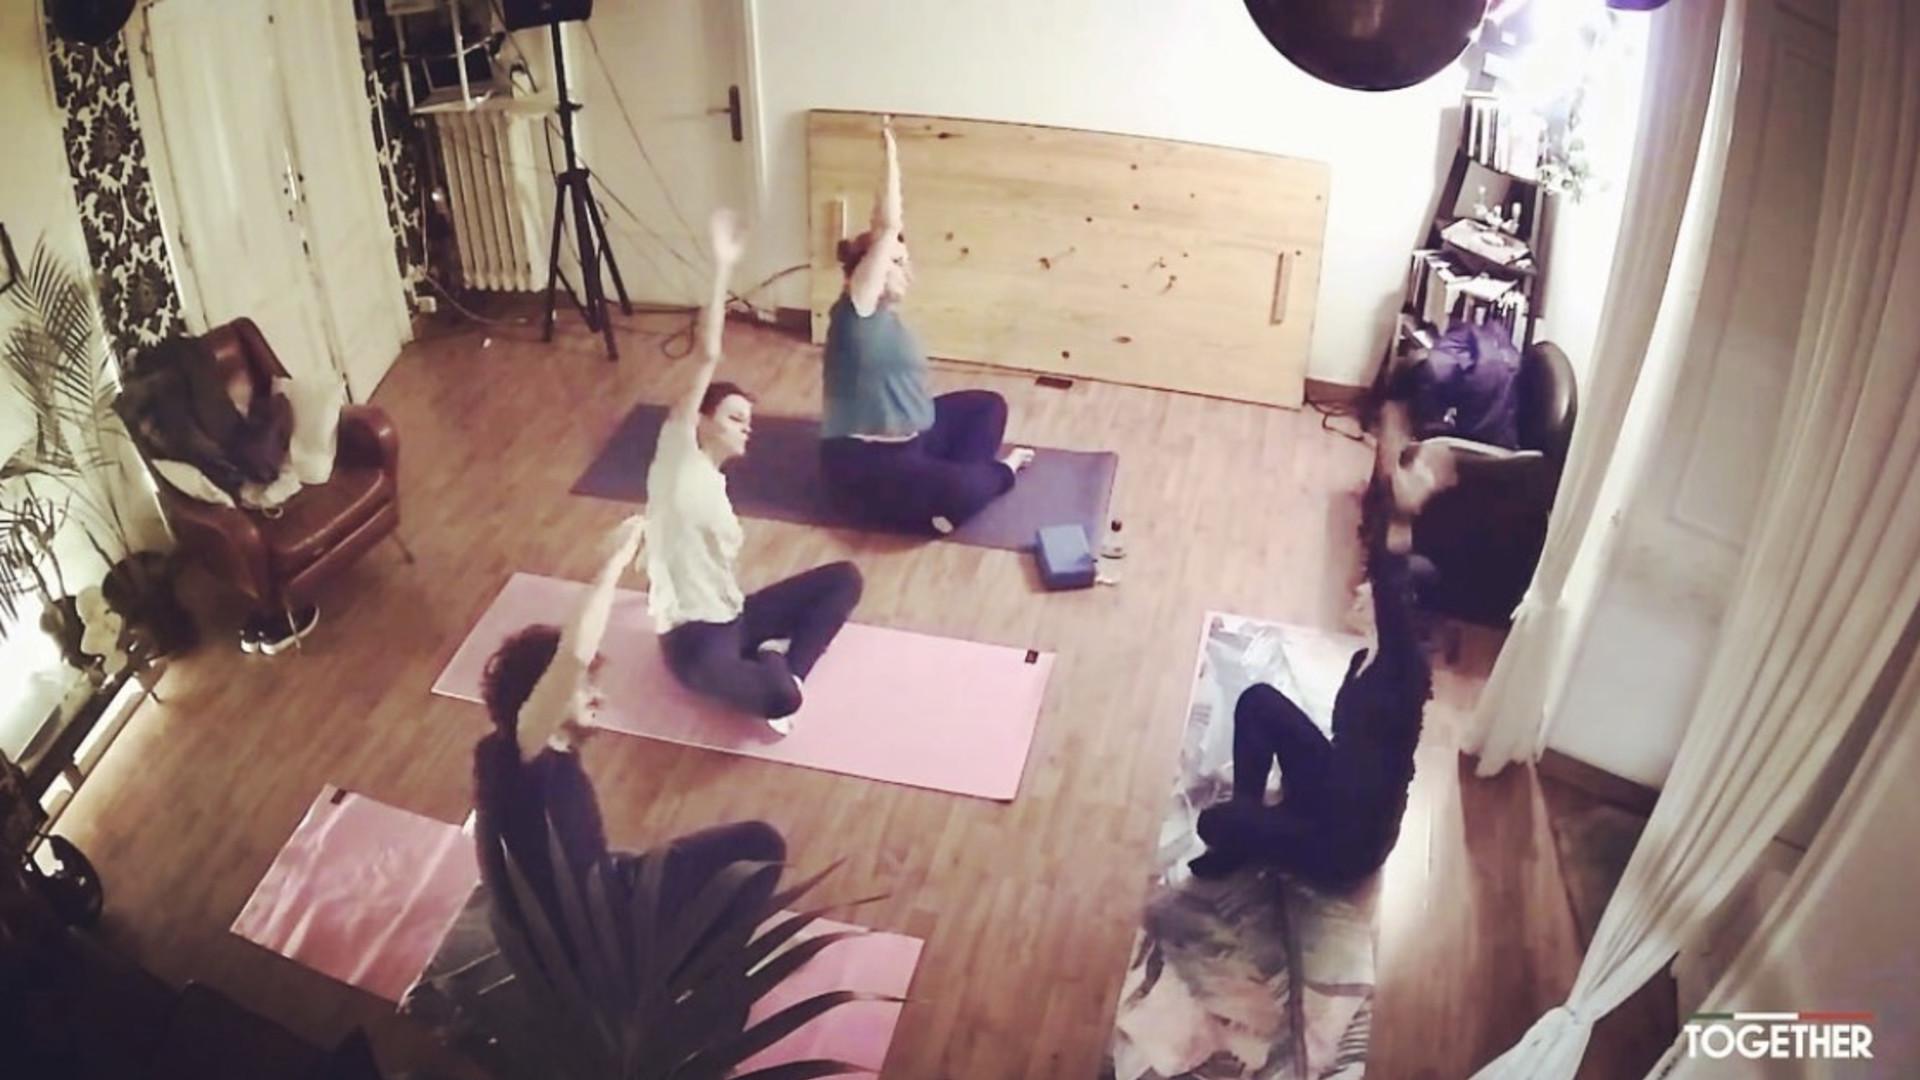 Yogassage Together prezzi